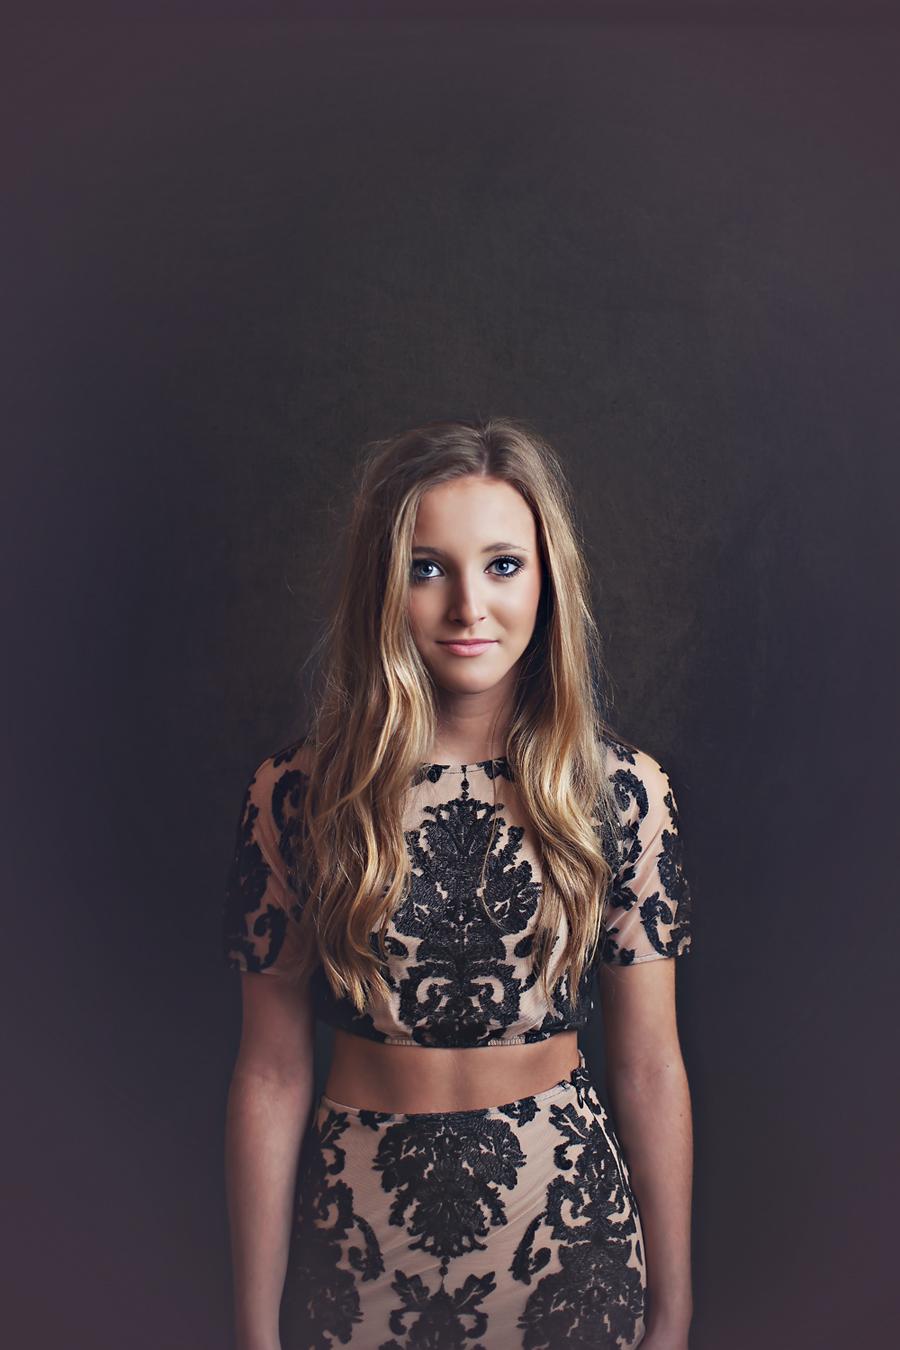 My Girls Mika Beth Edwards Photography Blog